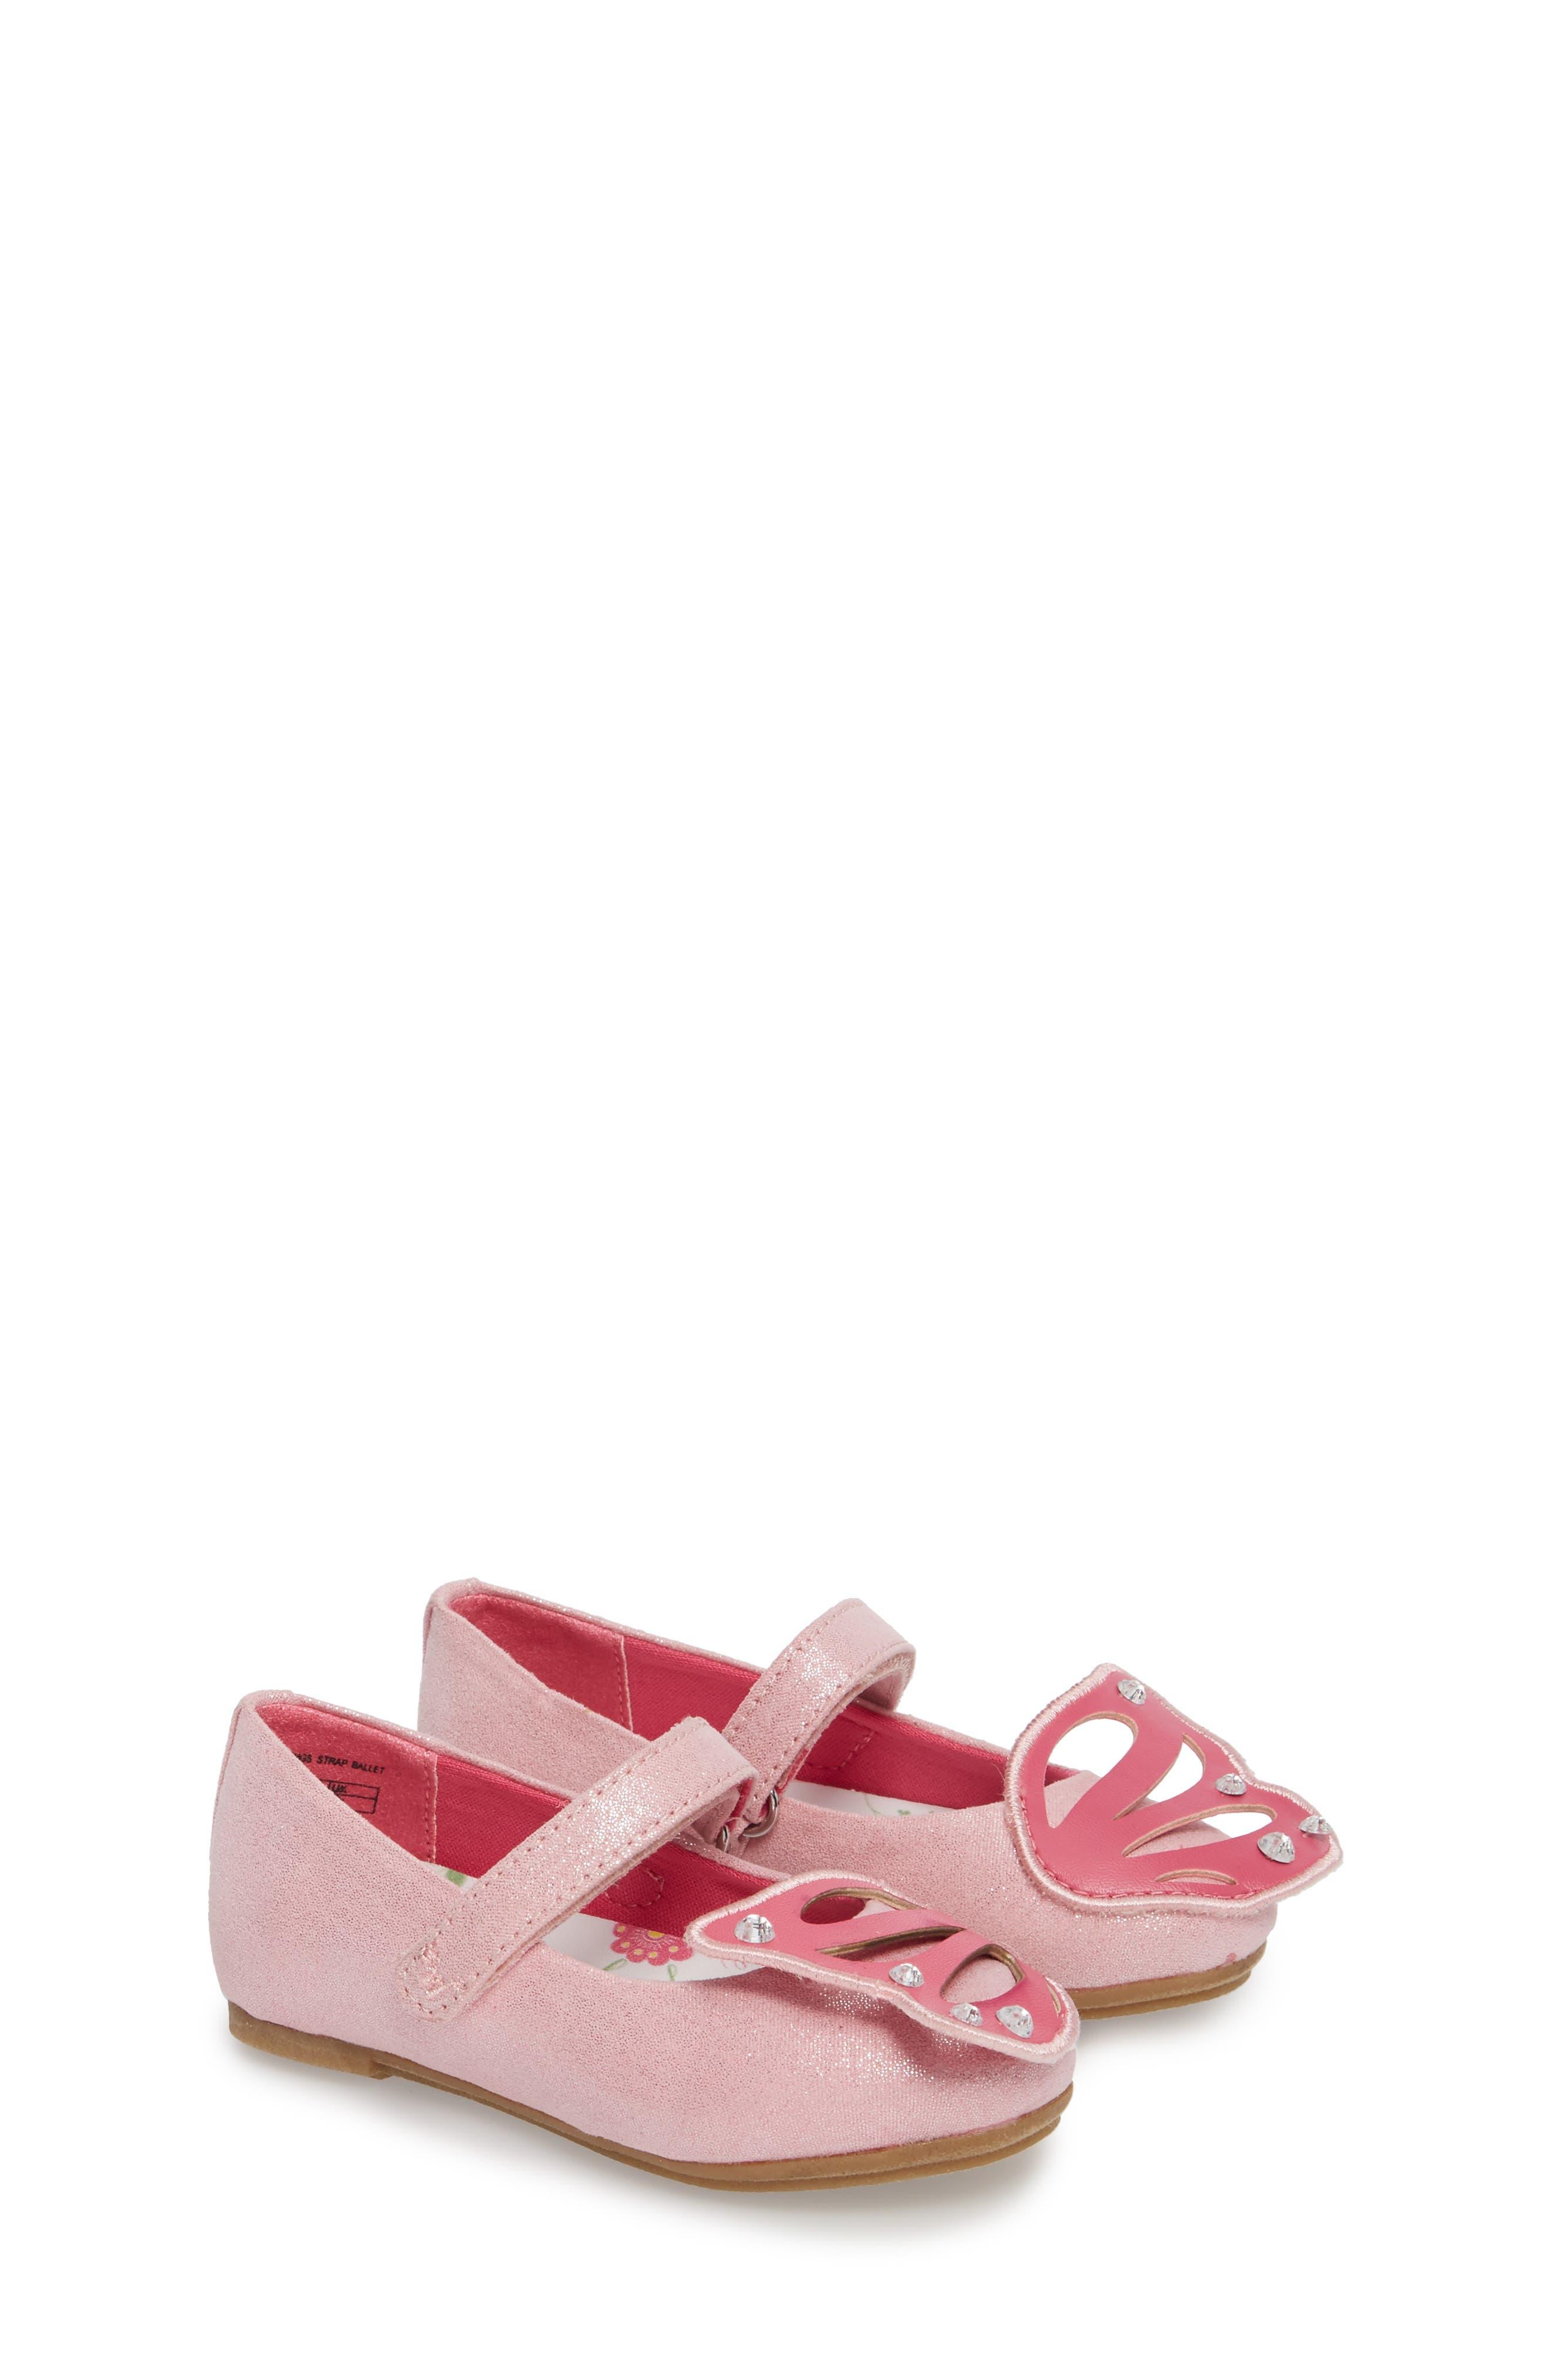 Main Image - WellieWishers from American Girl Flutter Wings Embellished Ballet Flat (Walker & Toddler)